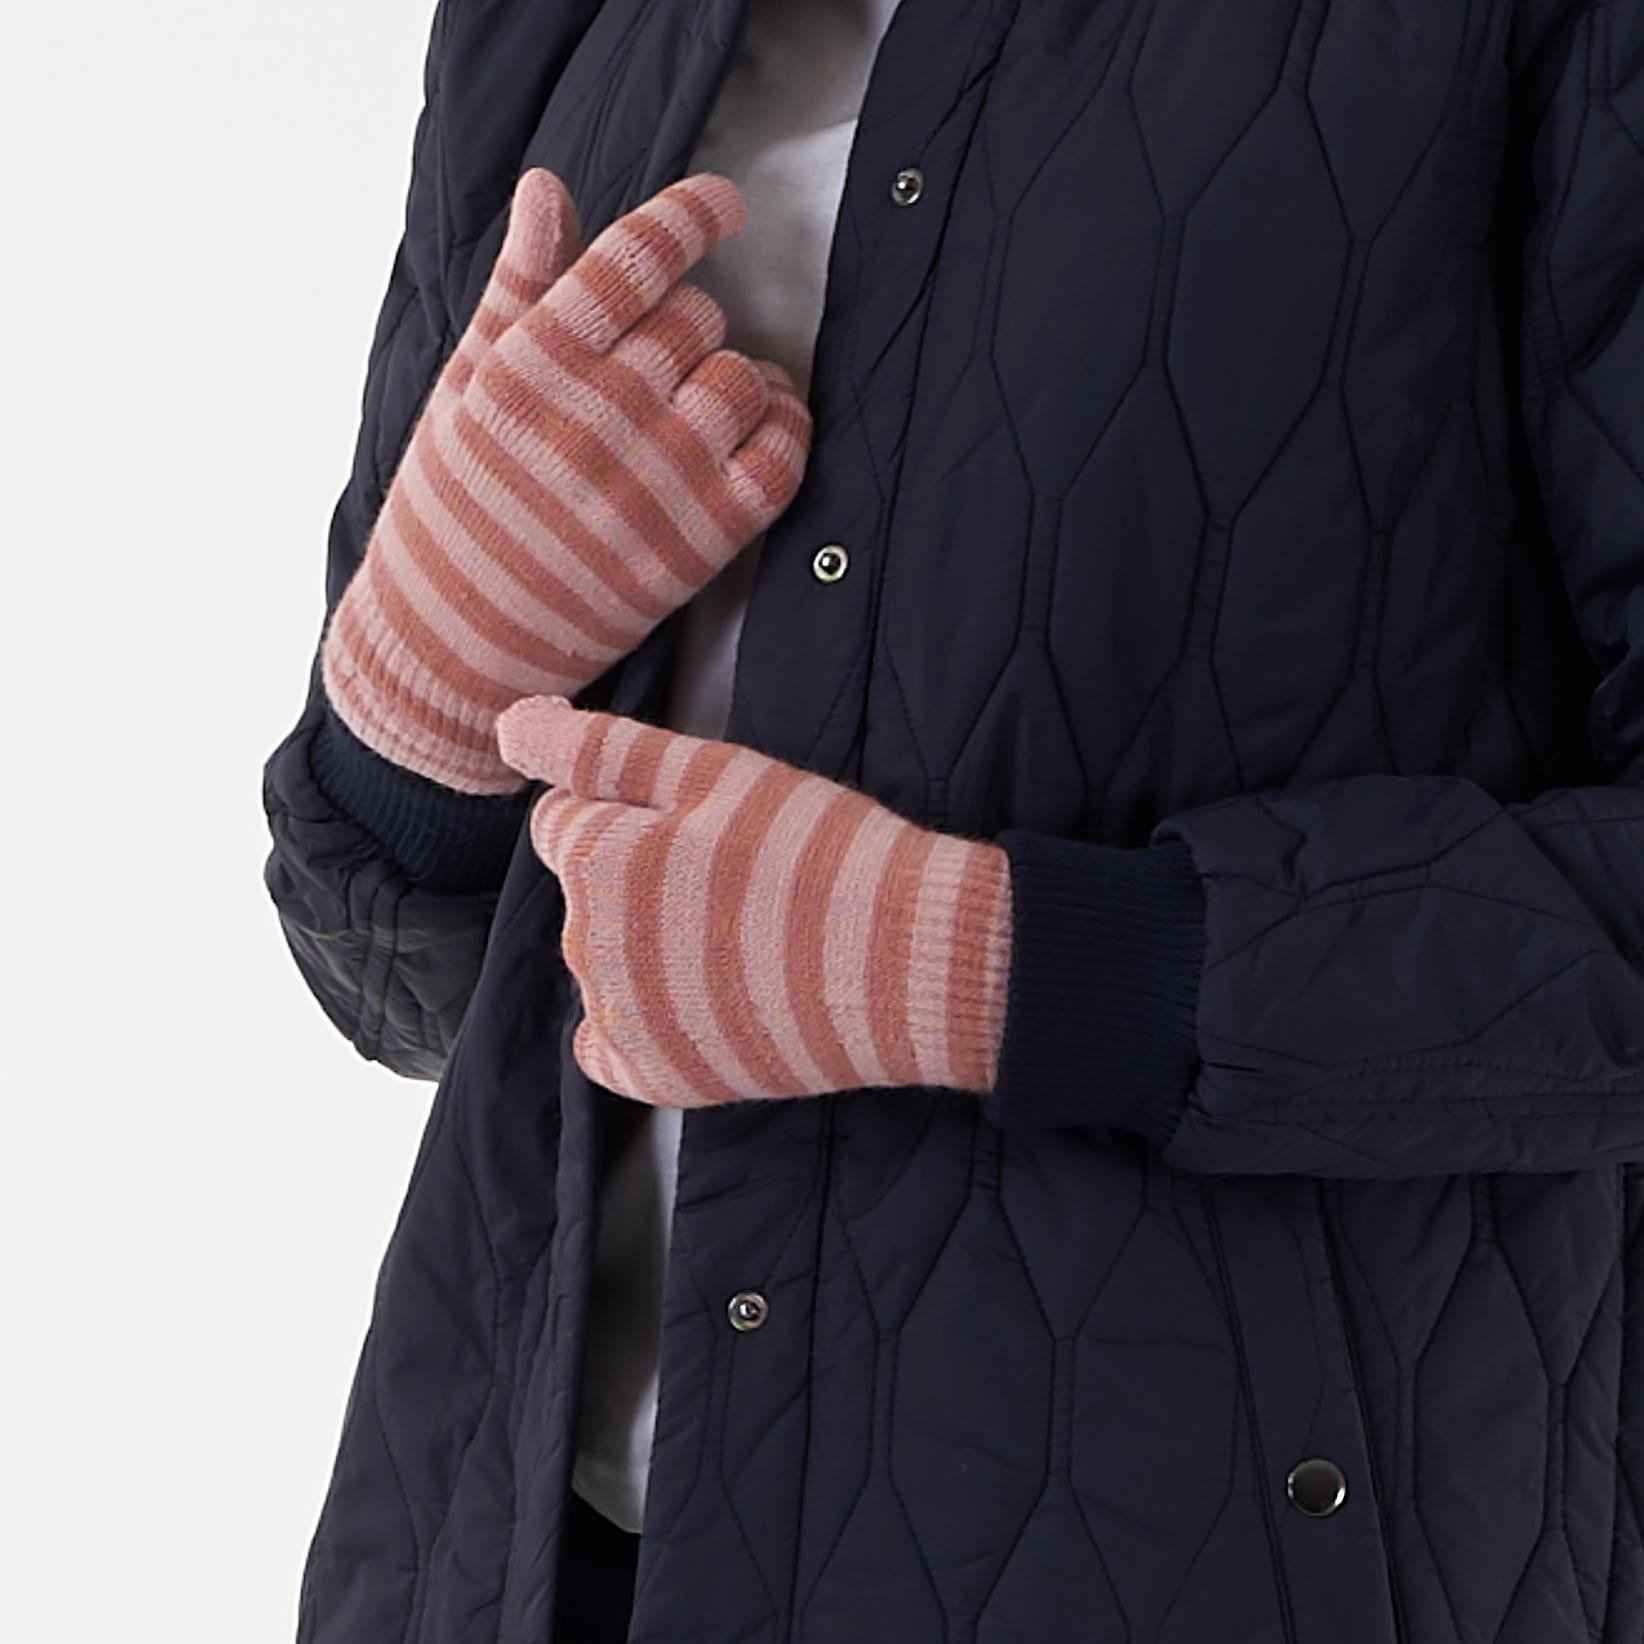 Pieces - Pcnew buddy stripe glove - Accessories til hende - PEACH SKIN - O/S